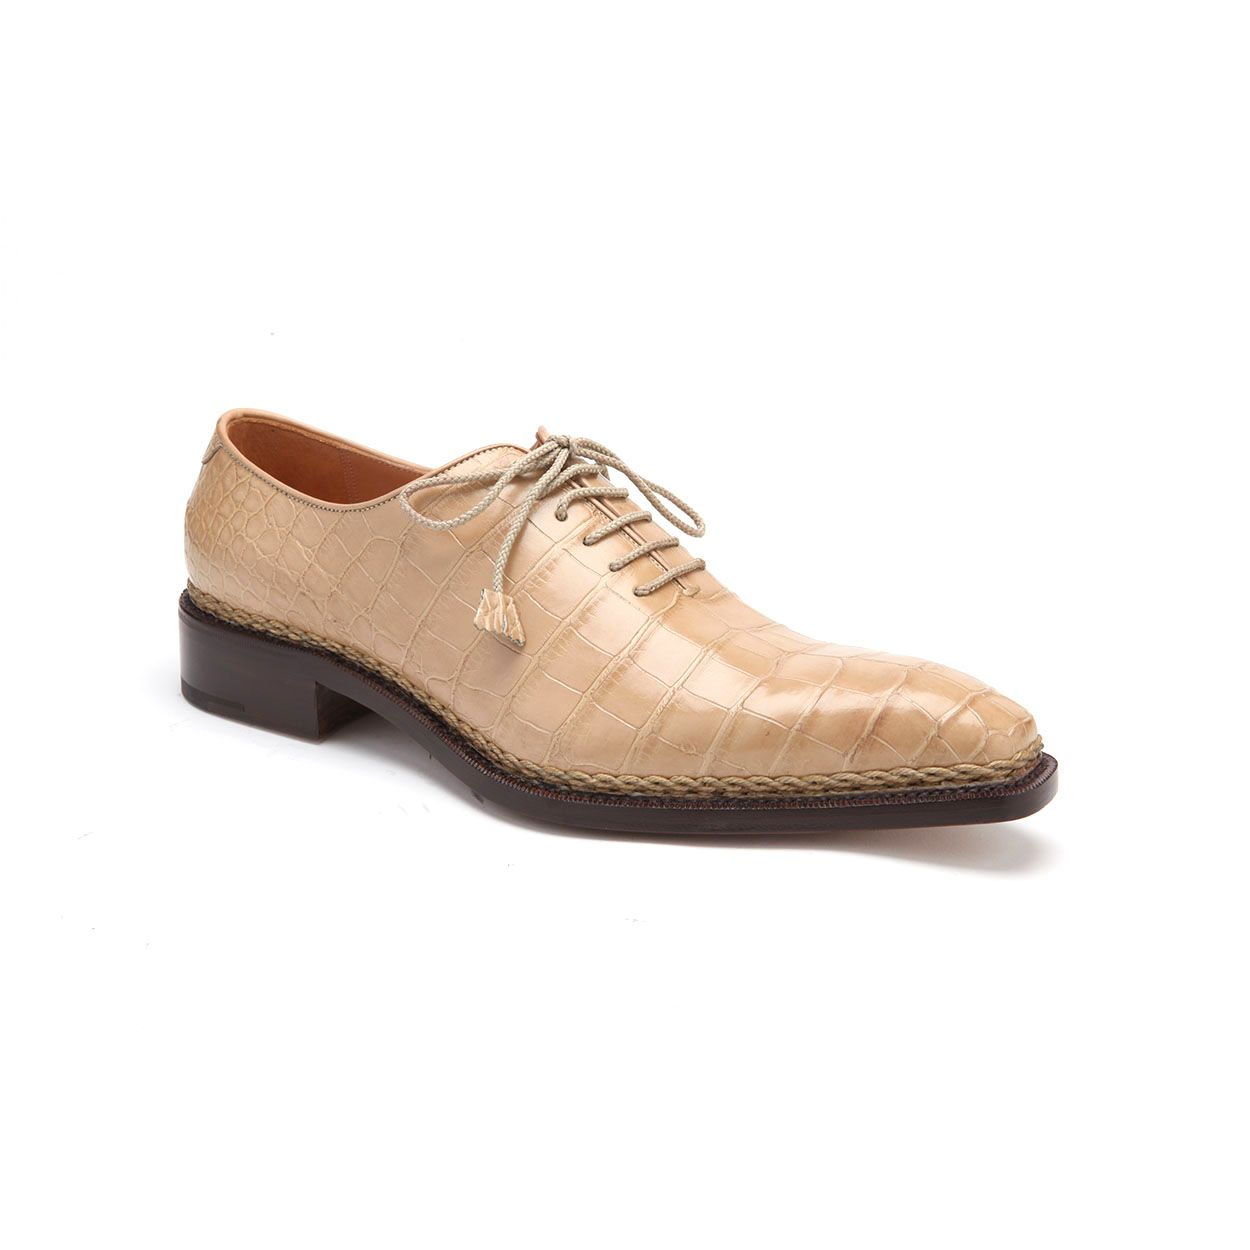 Caporicci Italian Mens Shoes Norwegian Construction Full Body Alligator Beige Oxfords Cap1103 Italian Shoes For Men Dress Shoes Men Men Shoes With Jeans